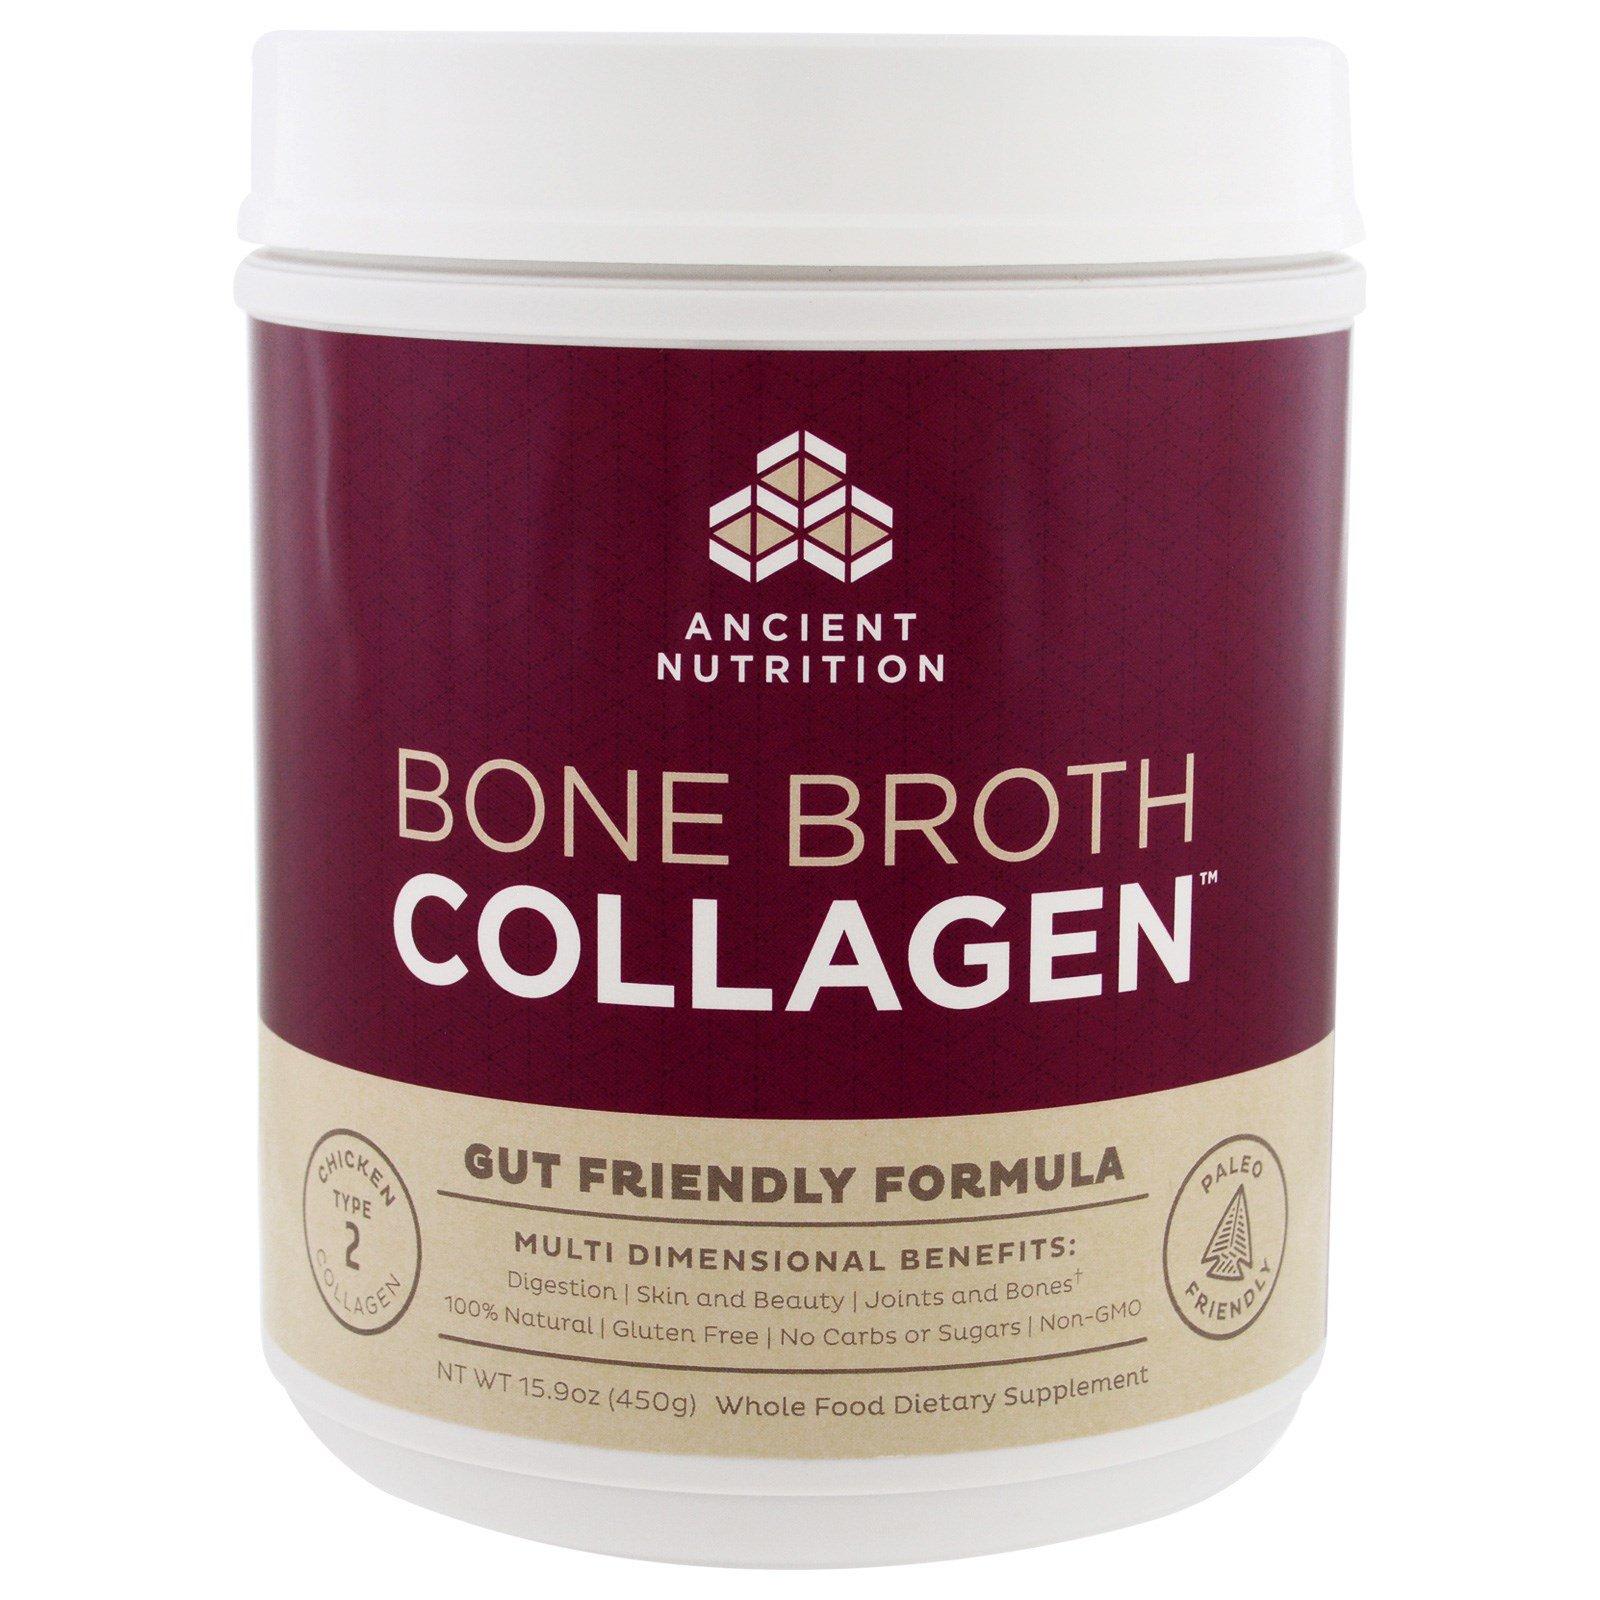 Exceptional Axe Ancient Bone Broth Oz Axe Ancient Bone Broth Oz Powdered Bone Broth Ramen Recipe Powdered Bone Broth Australia bark post Powdered Bone Broth